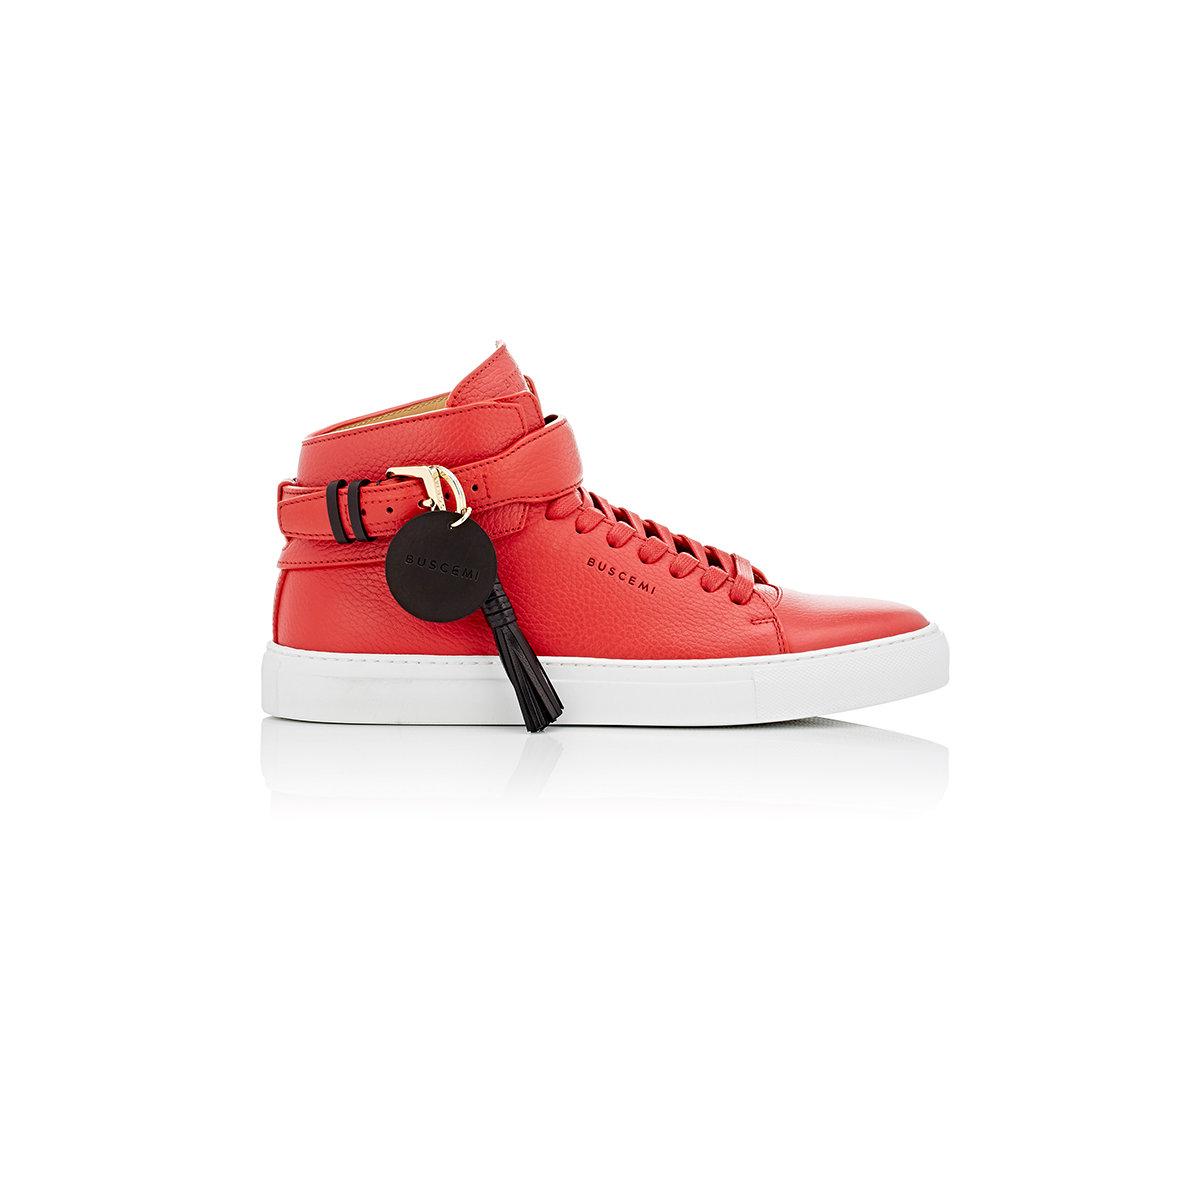 John Buscemi Nike Shoe